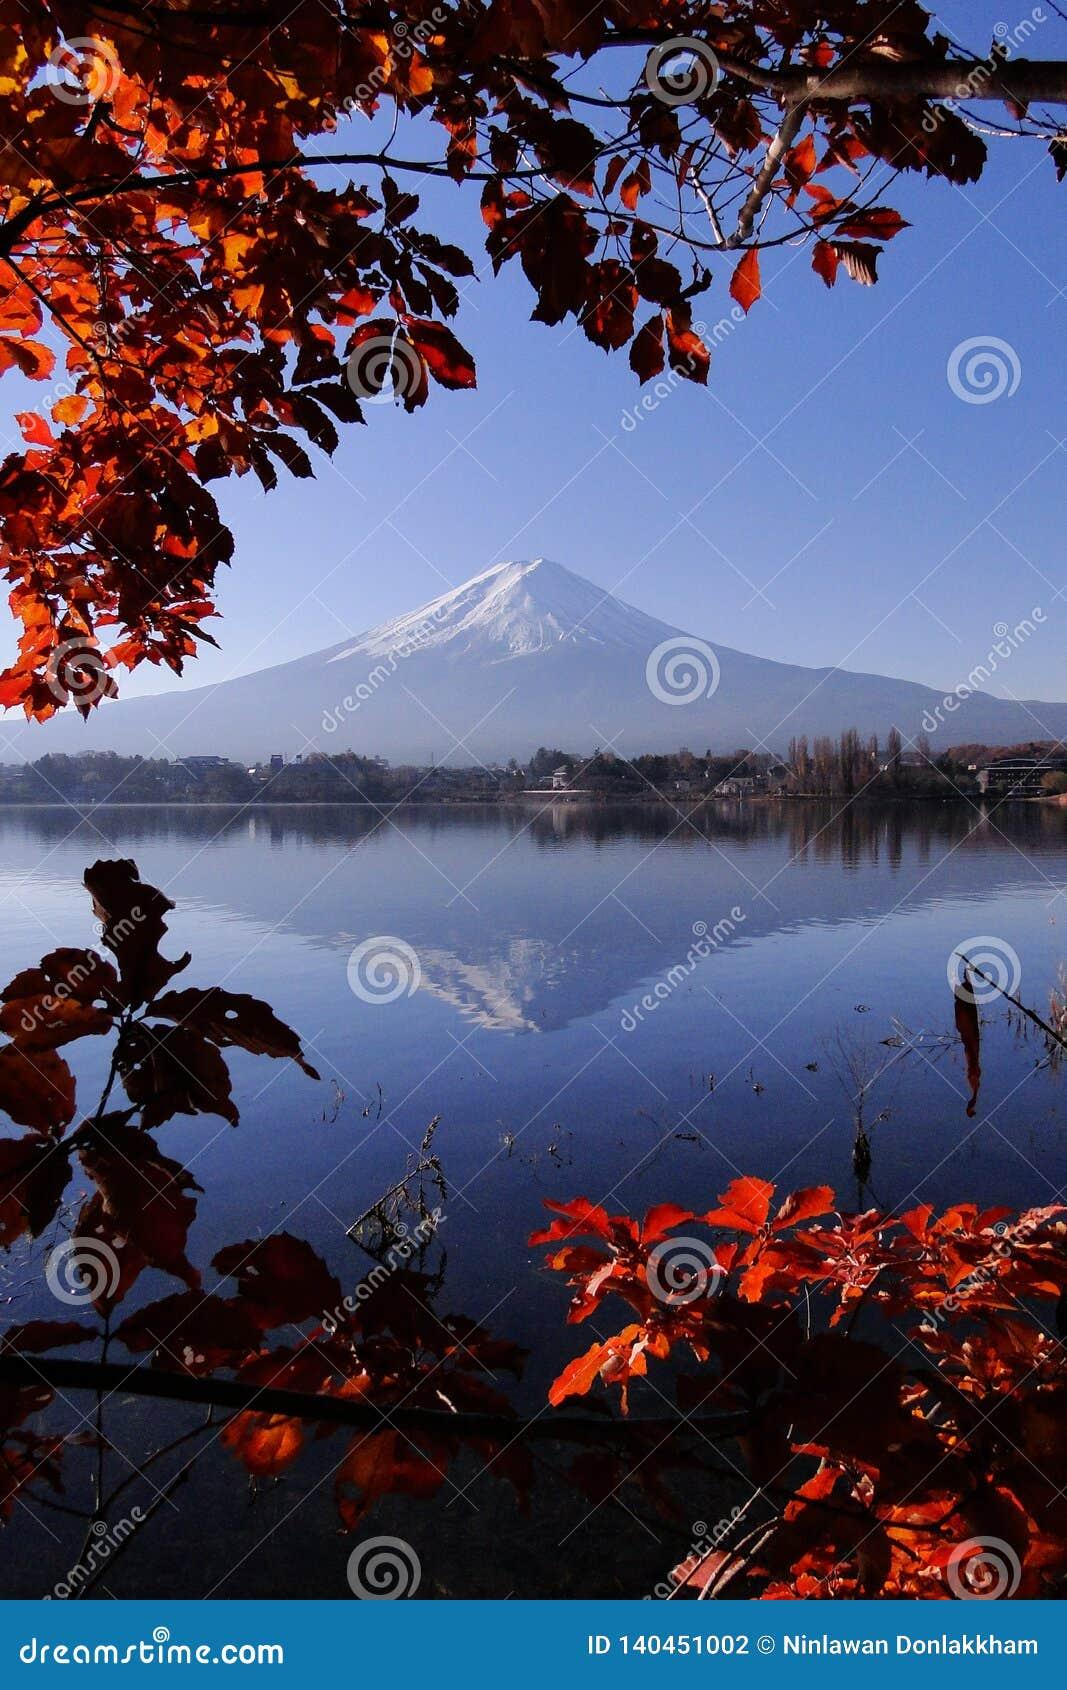 Mount Fuji Japanese iconic in autumn